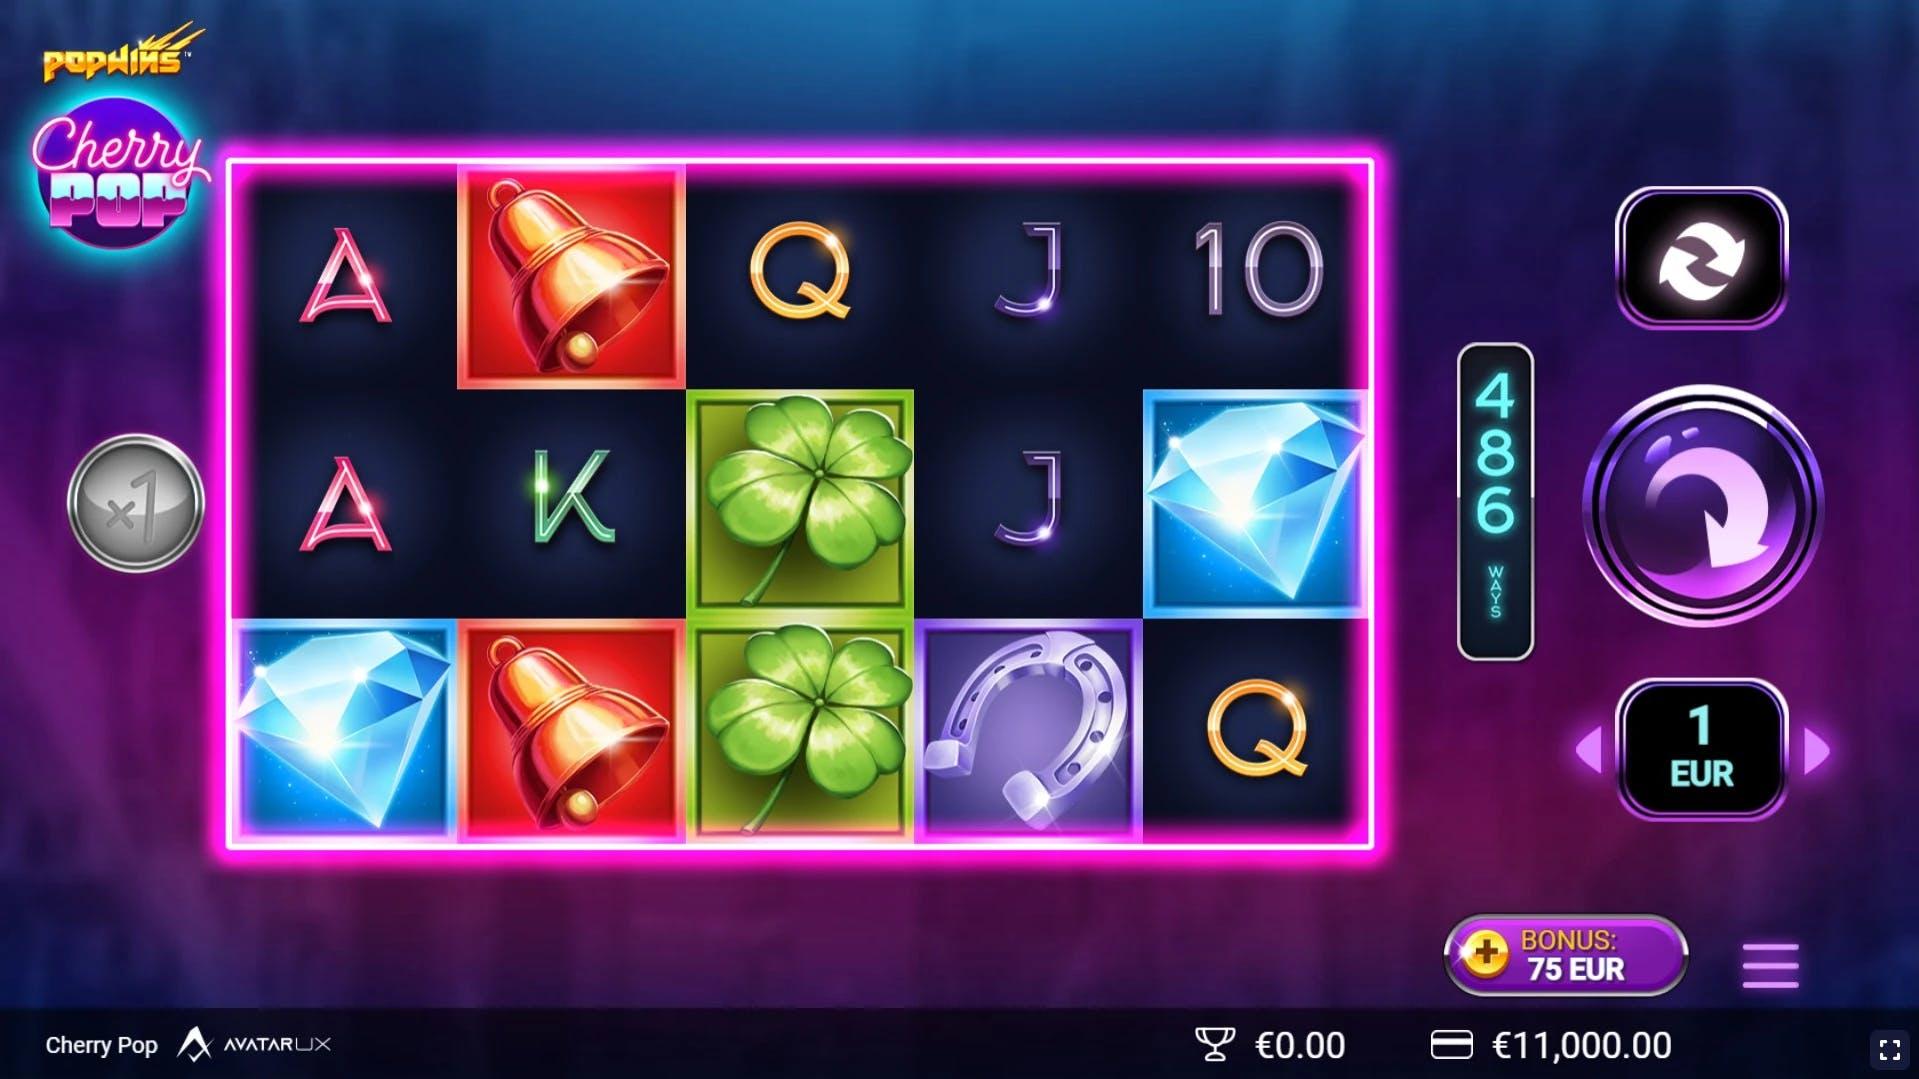 top slot cherry pop avatar ux et yggdrasil gameplay demo slot hd